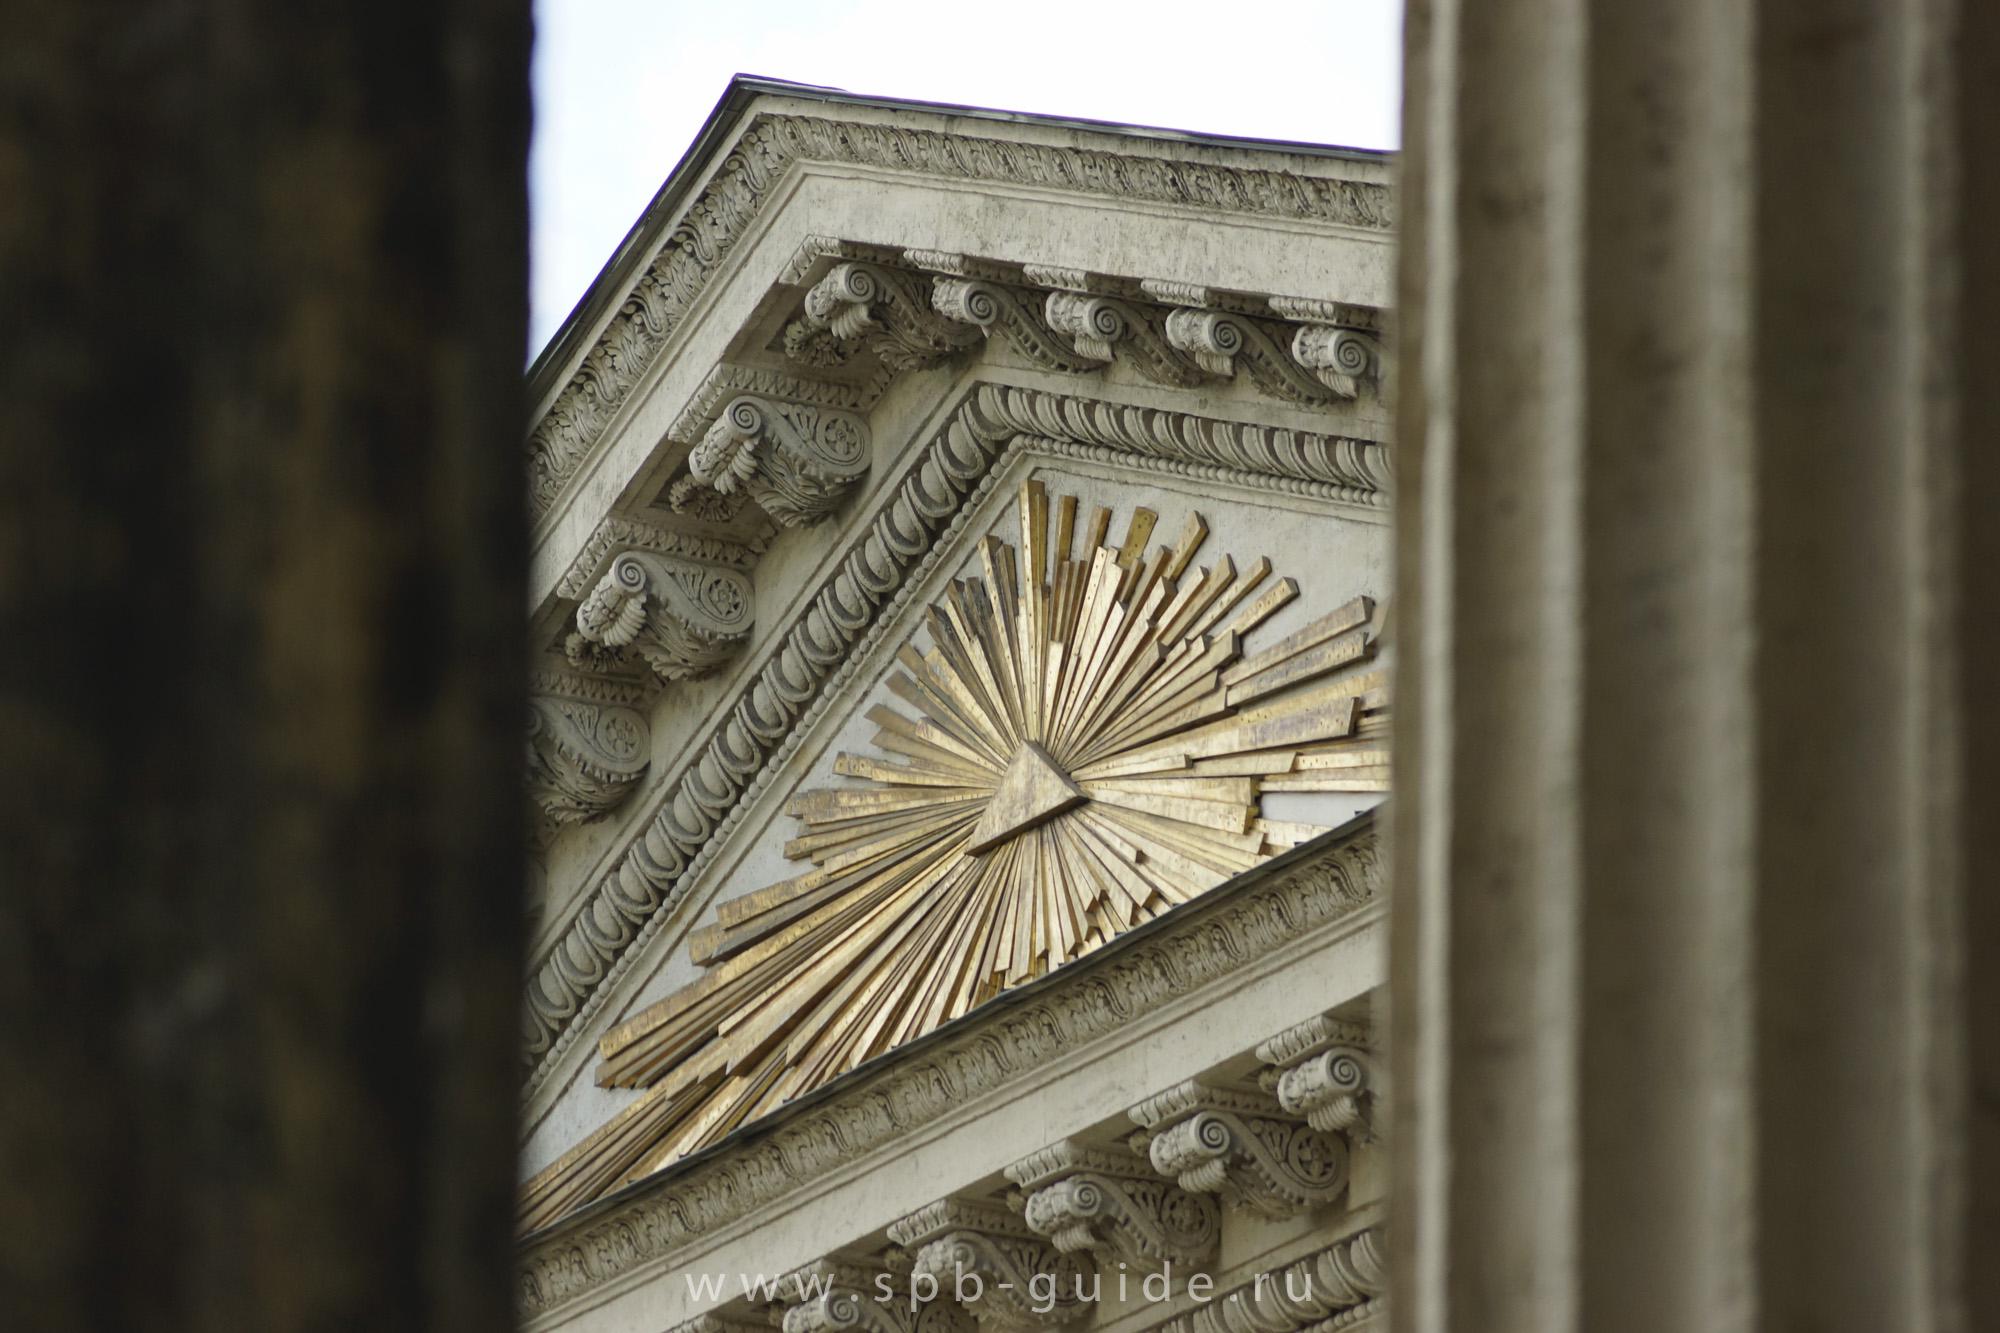 Тимпан Казанского собора в Санкт-Петербурге - фото с сайта spb-guide.ru